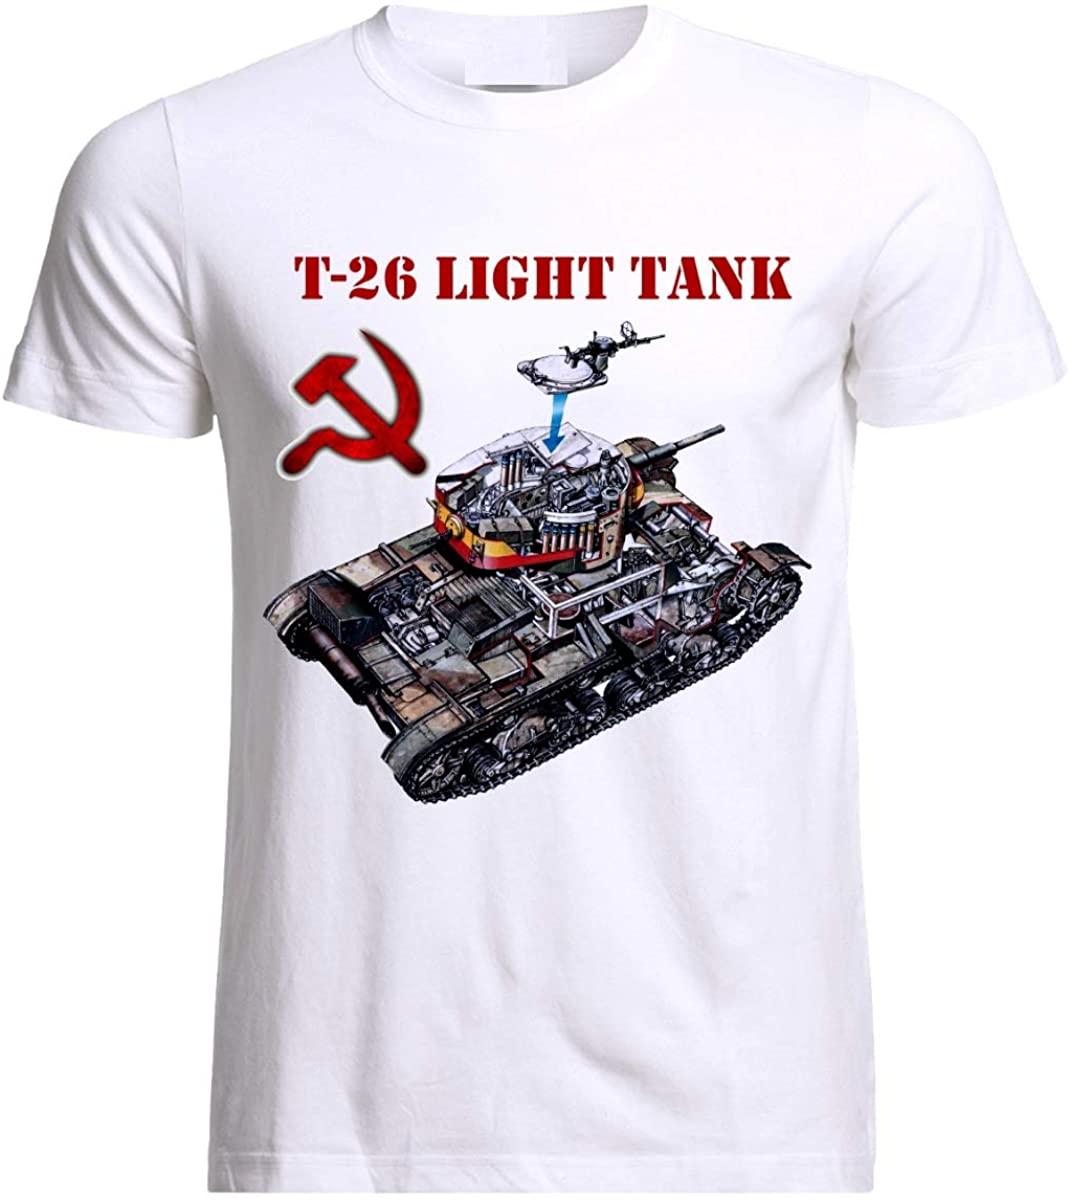 USSR Russian T-26 Tank T-Shirt Panzer Armure The Second World War Army Cotton O-Neck Short Sleeve Men's T Shirt New Size S-3XL